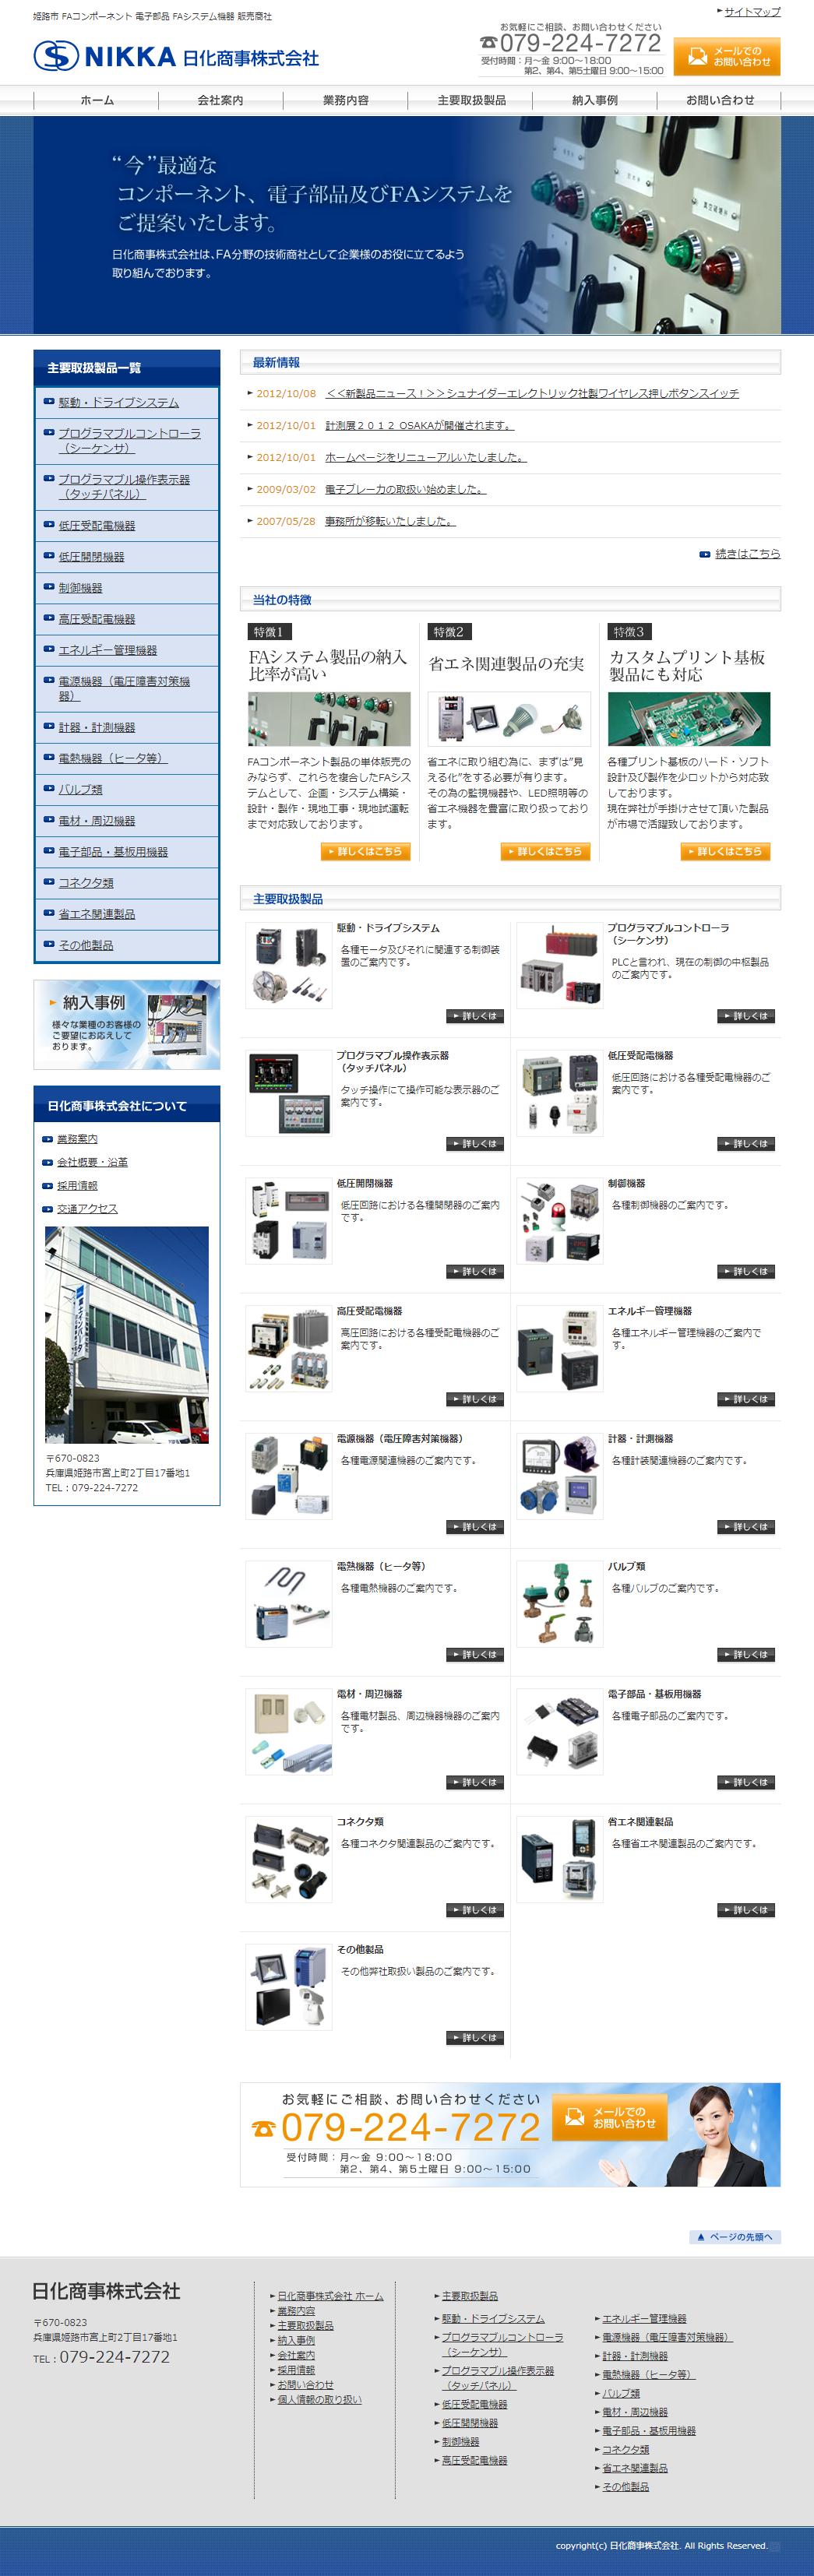 姫路市 日化商事株式会社様 ホームページ制作1